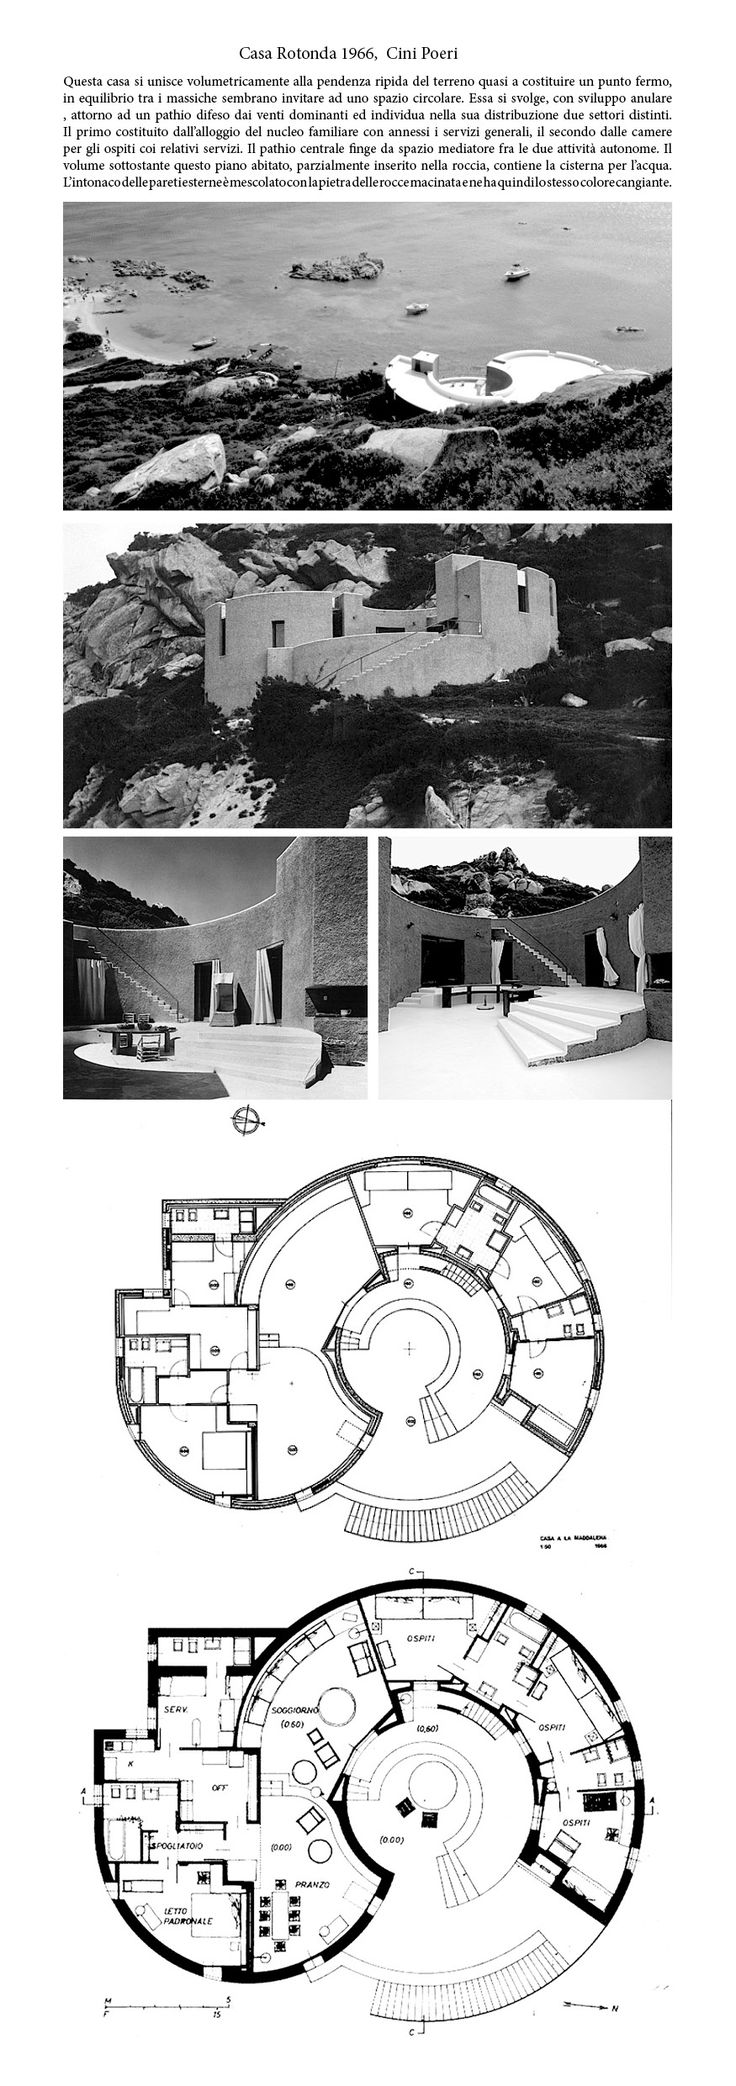 Cini Boeri | Casa Rotonda | La Maddalena, Sassari, Italia | 1966-67